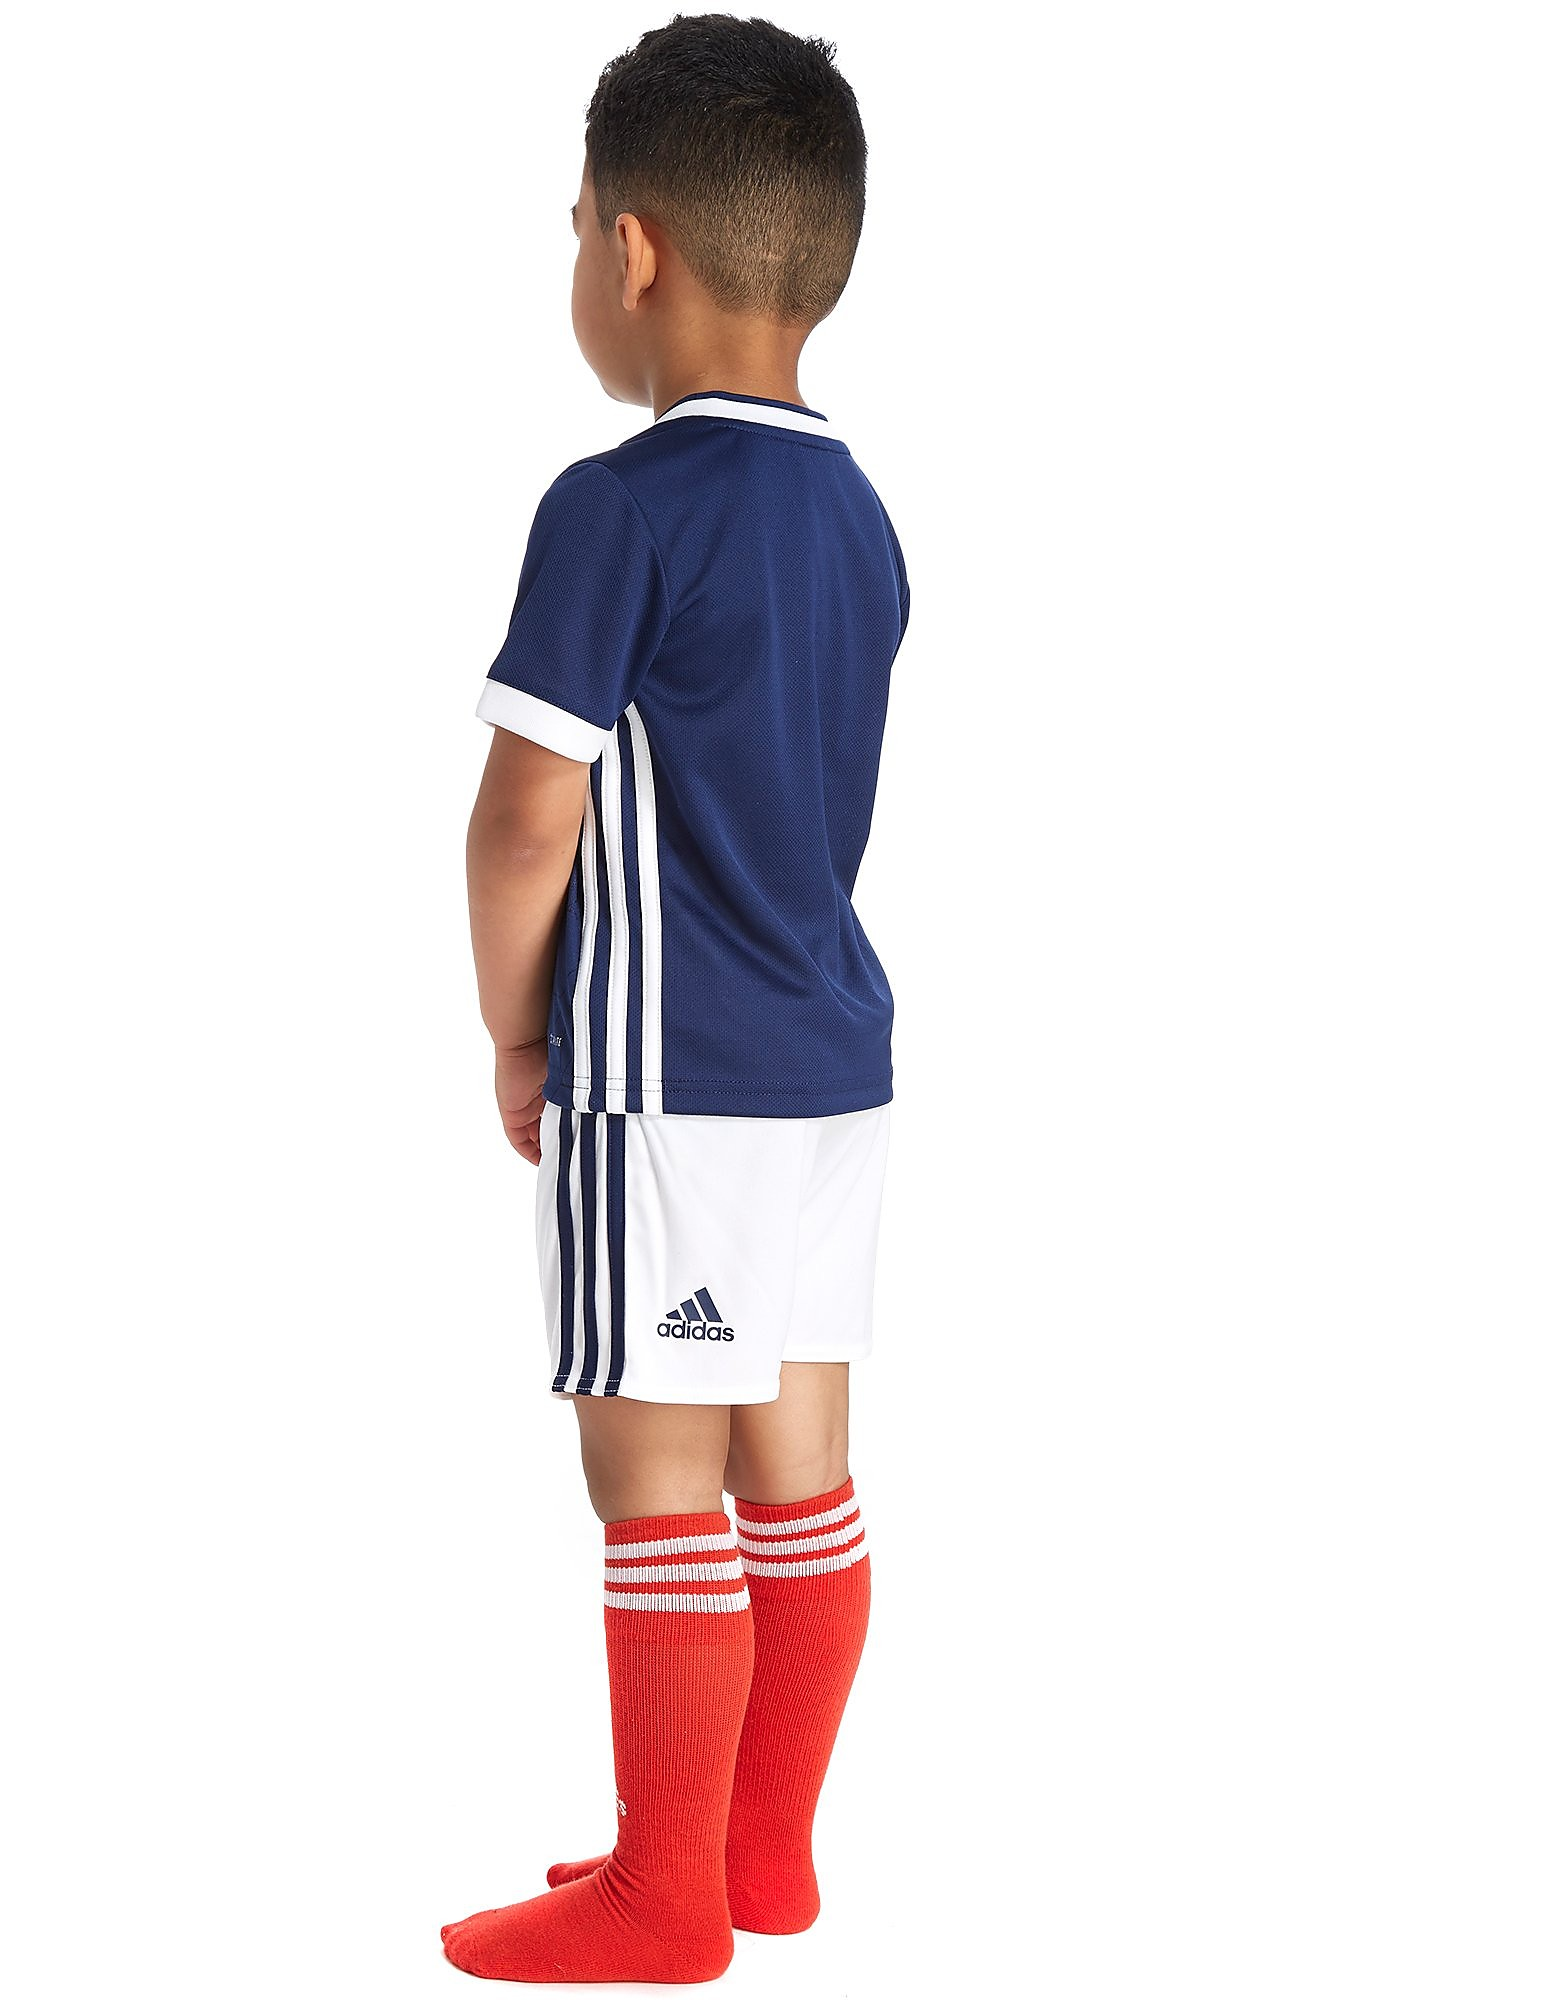 adidas Scotland 2017/18 Home Kit Children